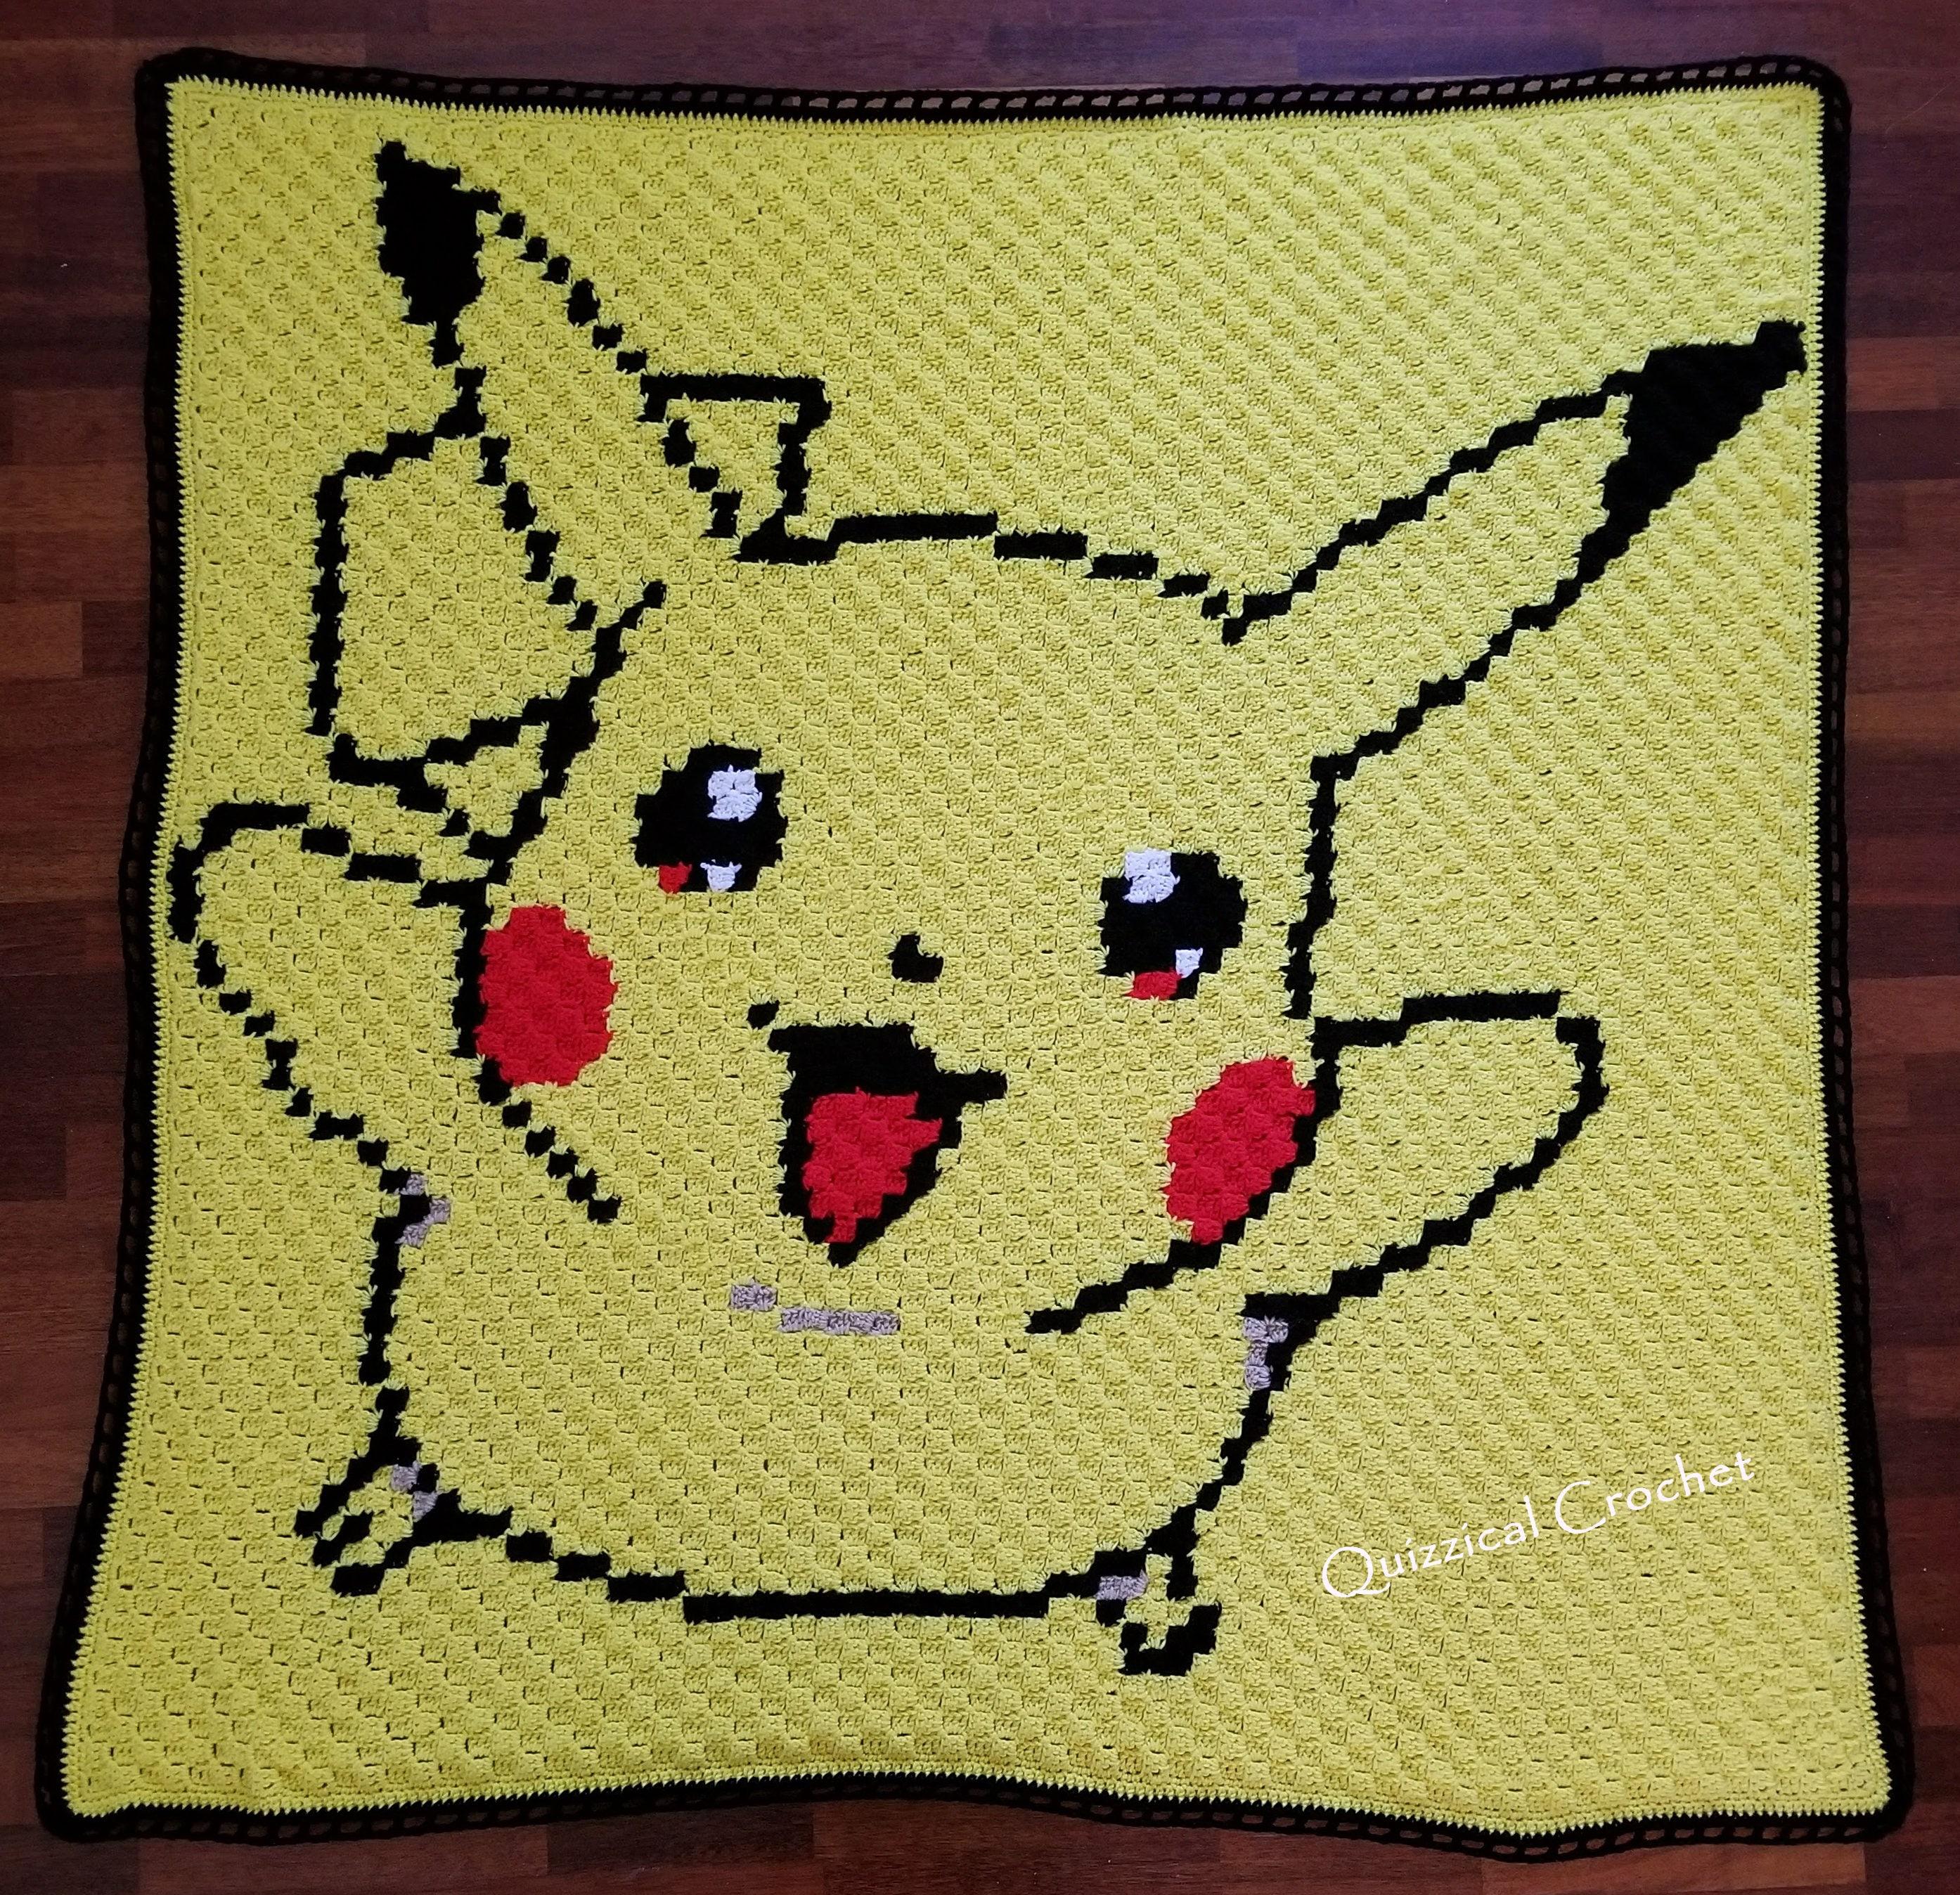 Pikachu Corner to Corner Crochet Blanket Pattern